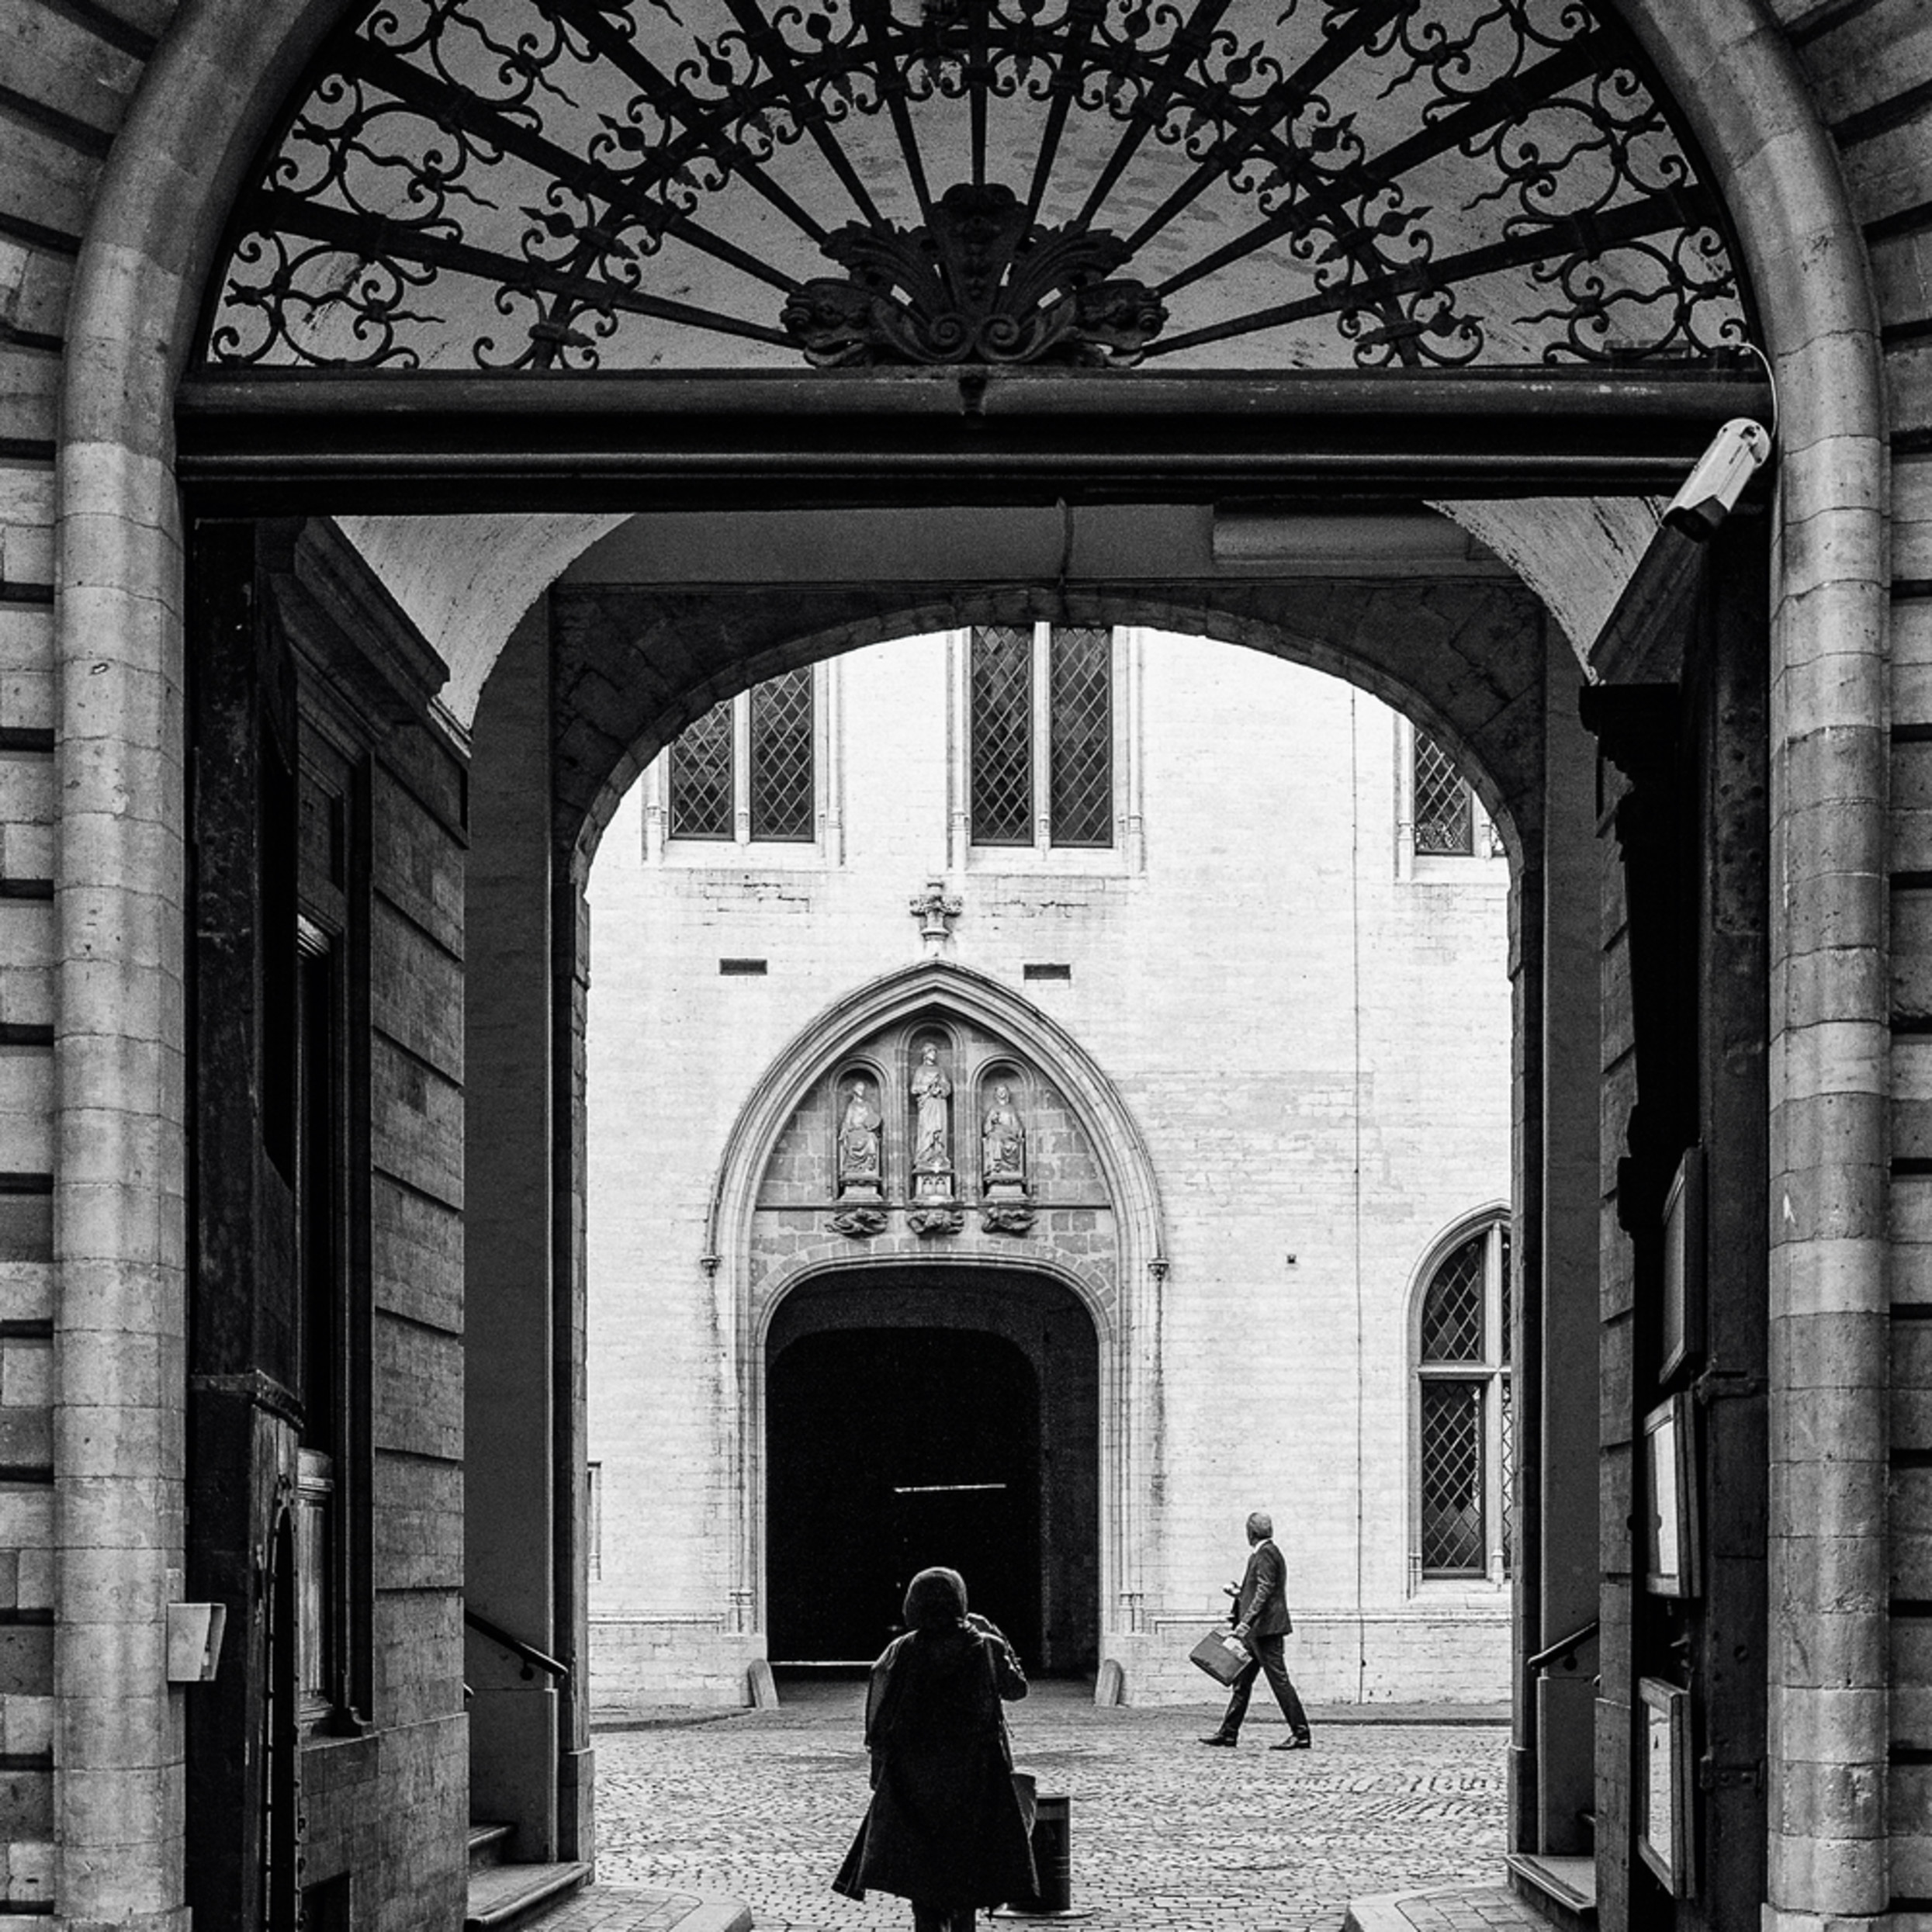 Archway rue de l etuve brussels belgium 2018 sb31hg